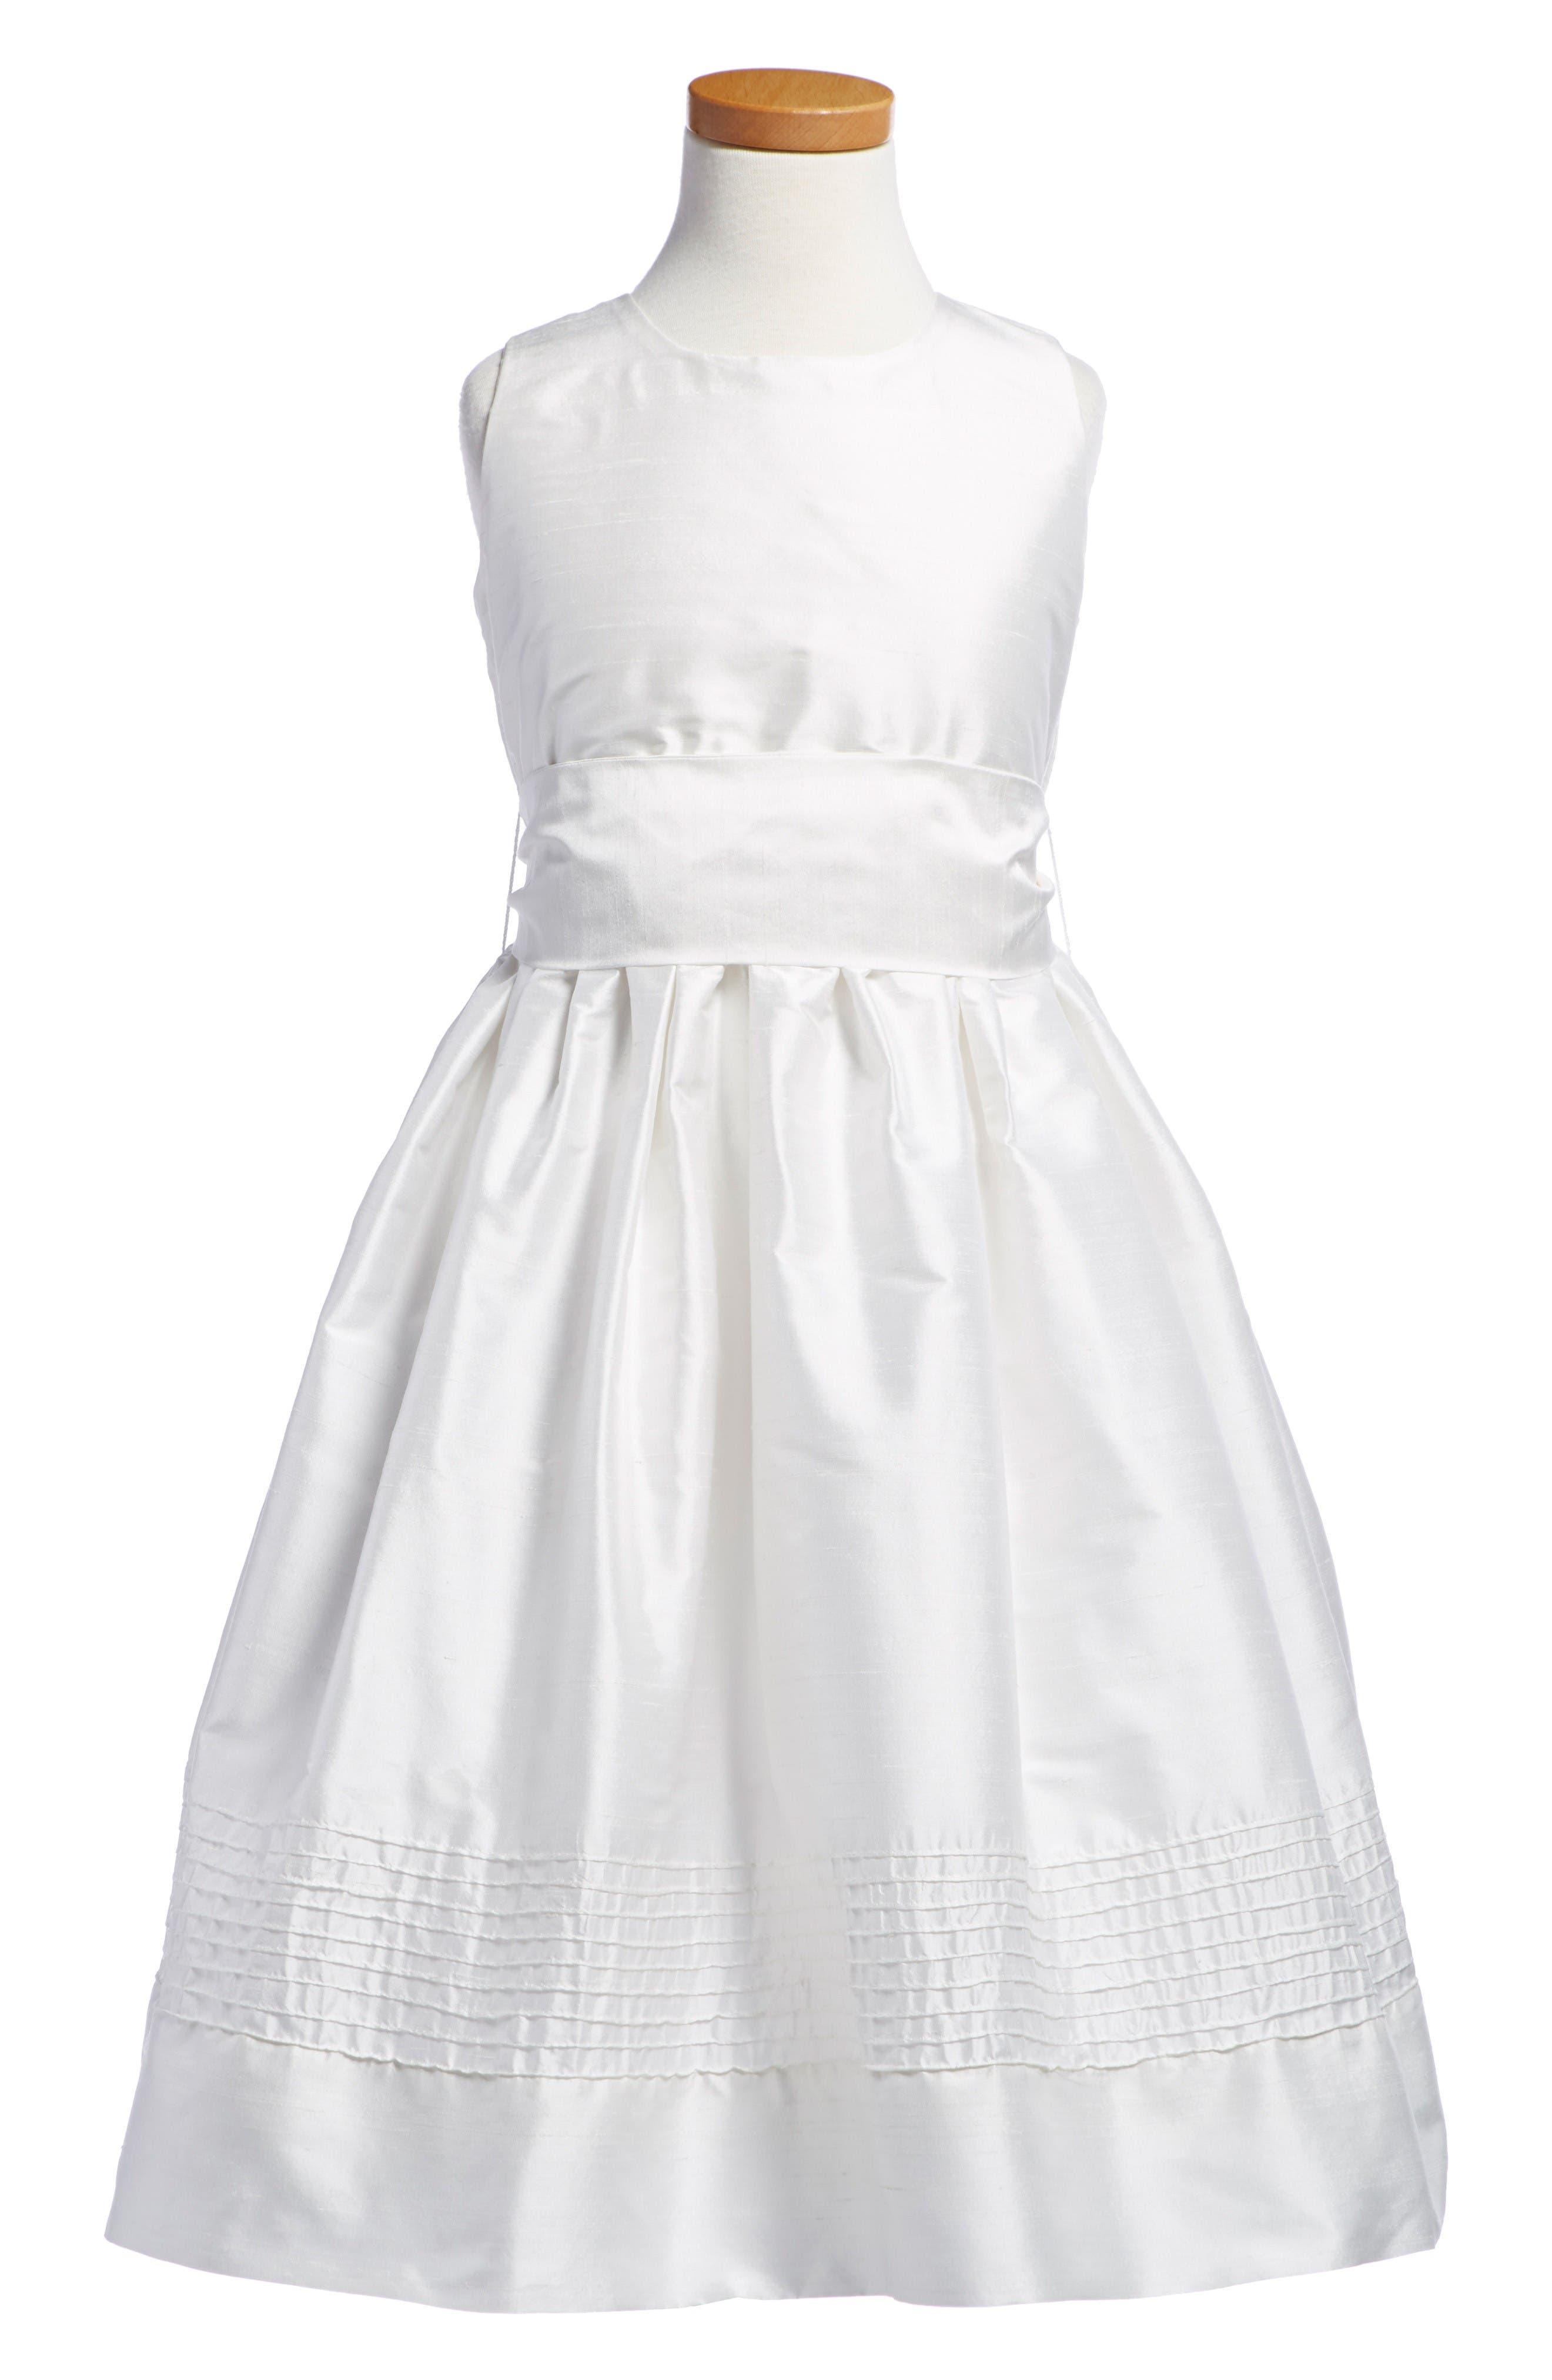 'Timeless' Sleeveless Dress,                         Main,                         color, 105